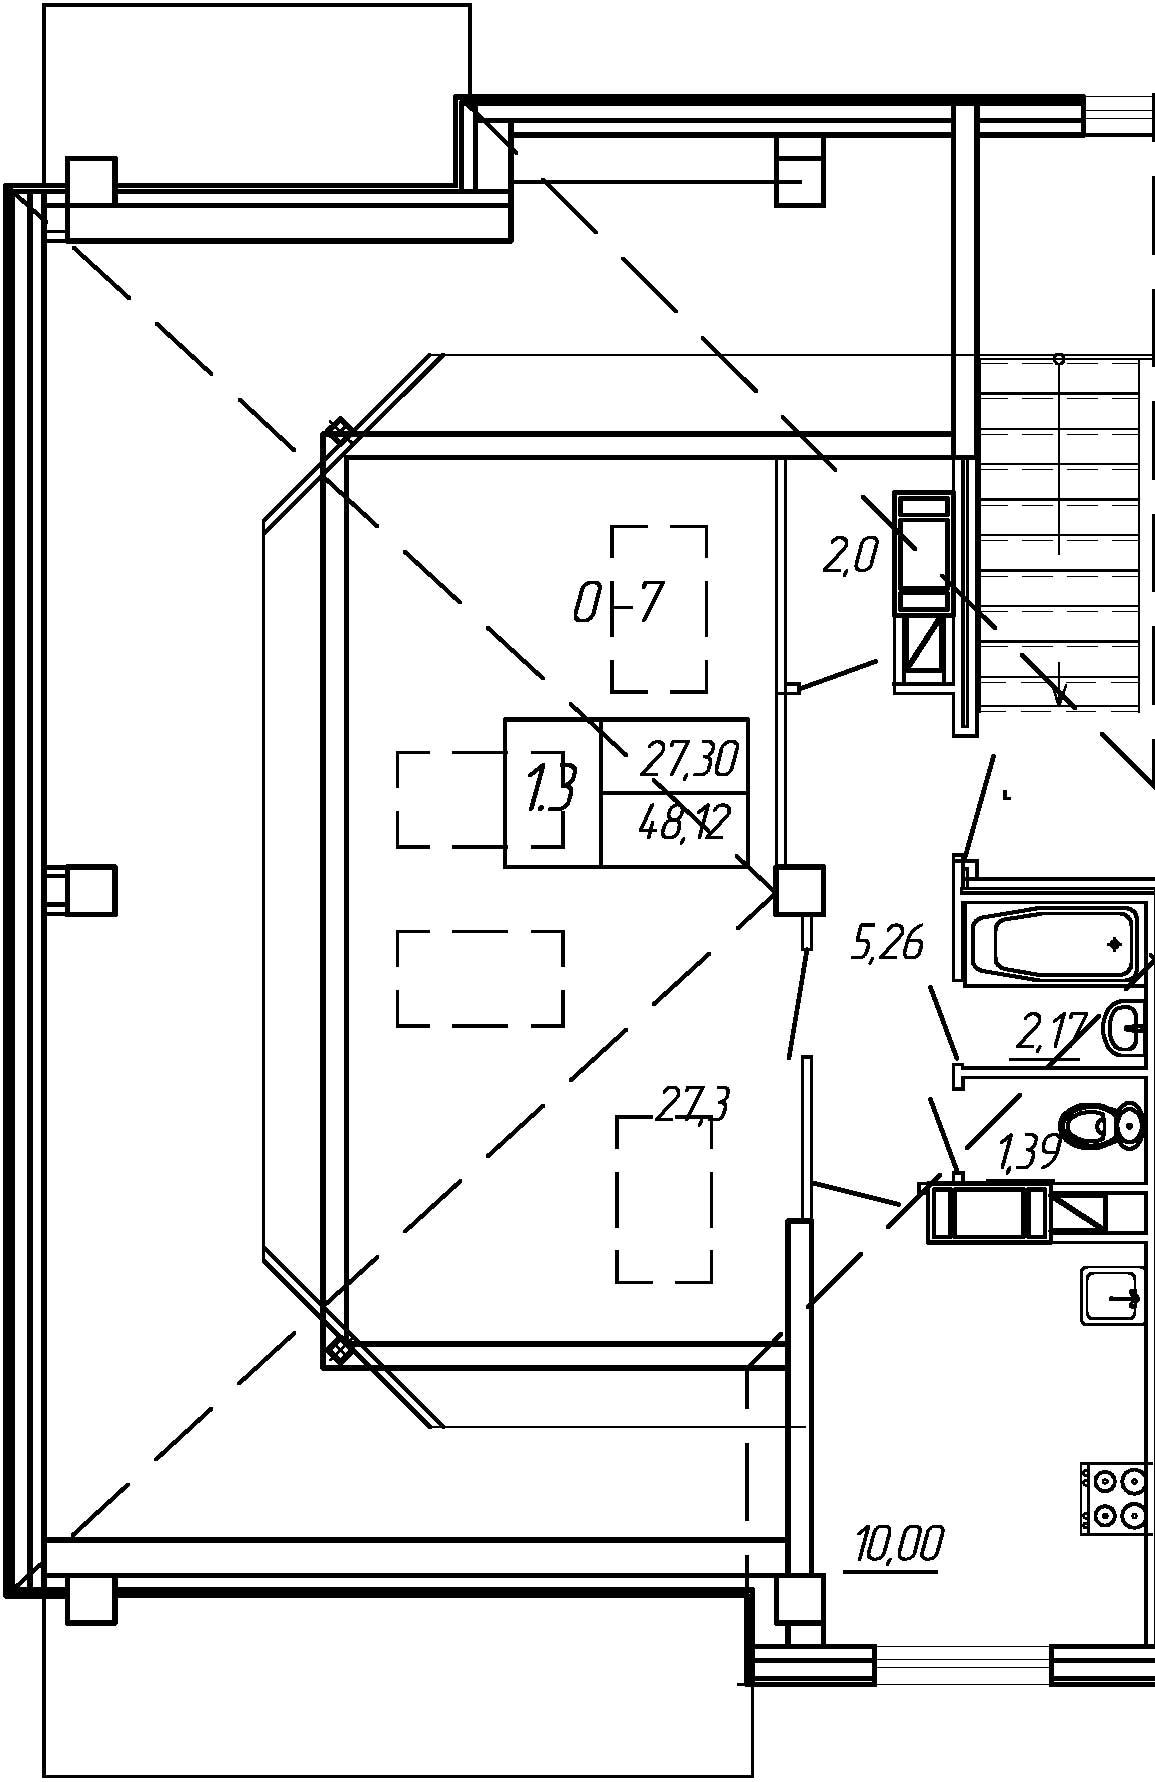 Жилойдом по ул.Мохова, 40(по ГП), Однокомнатная квартира площадью 48.12 м2